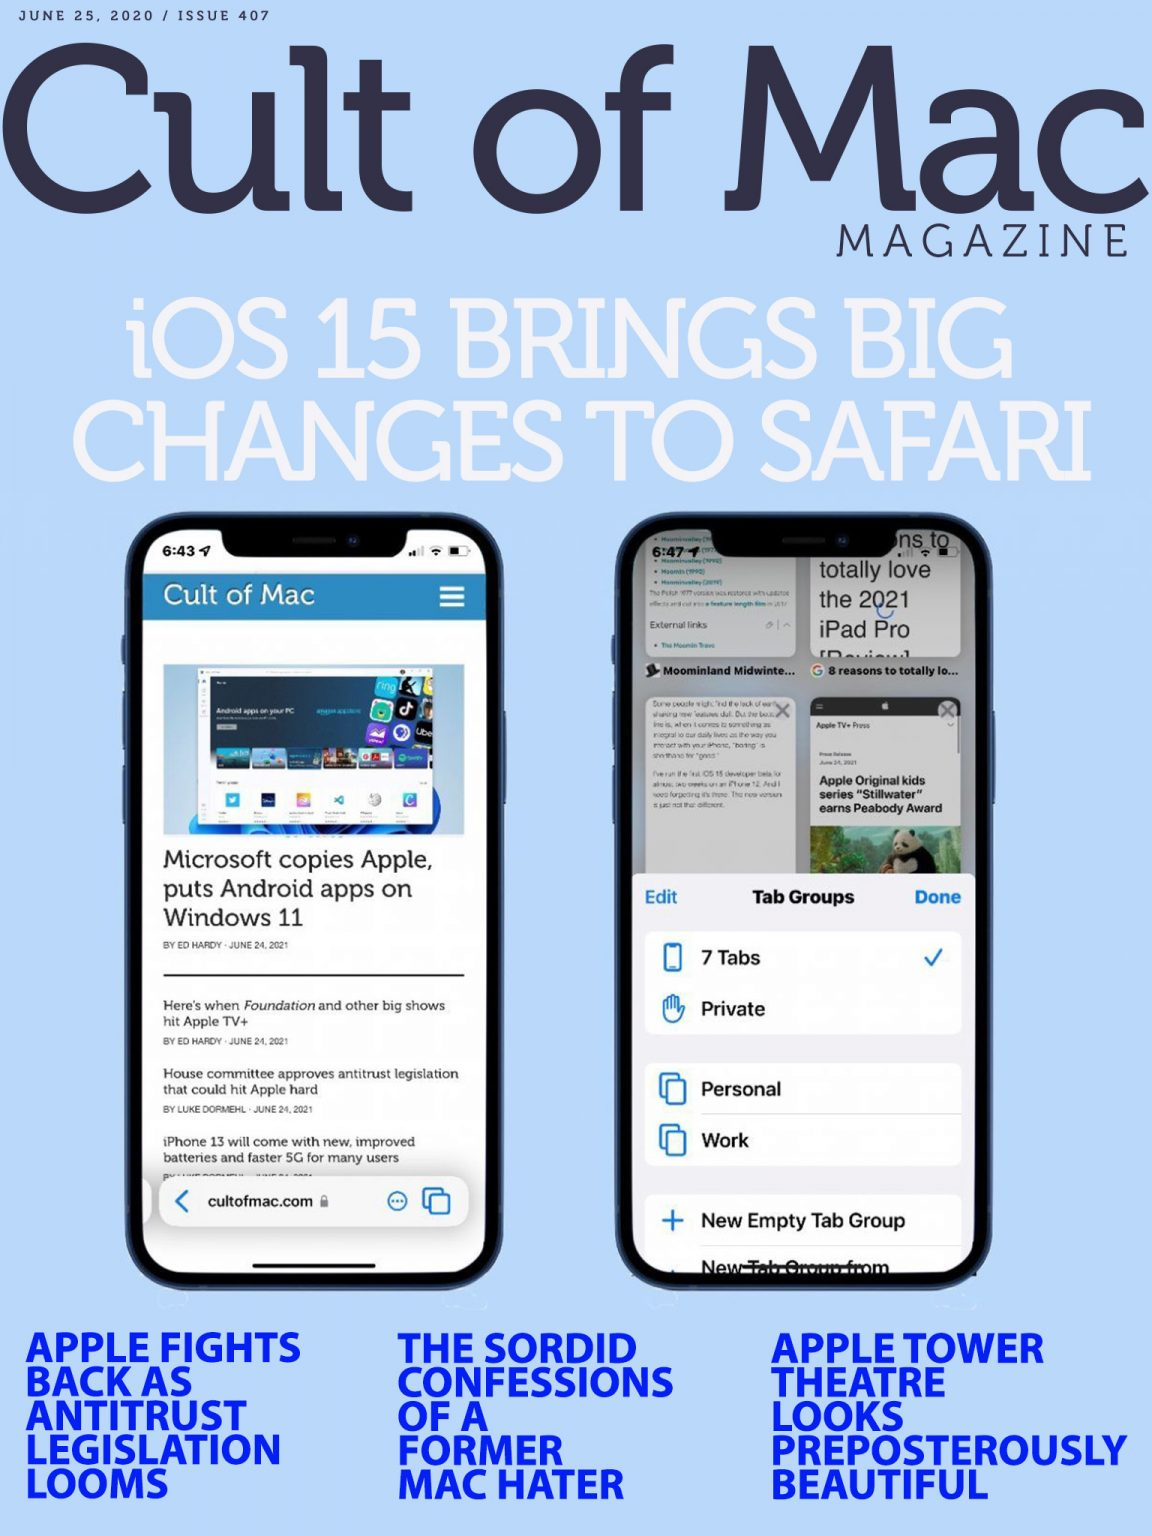 In iOS 15, Safari's Address Bar gets a new address.